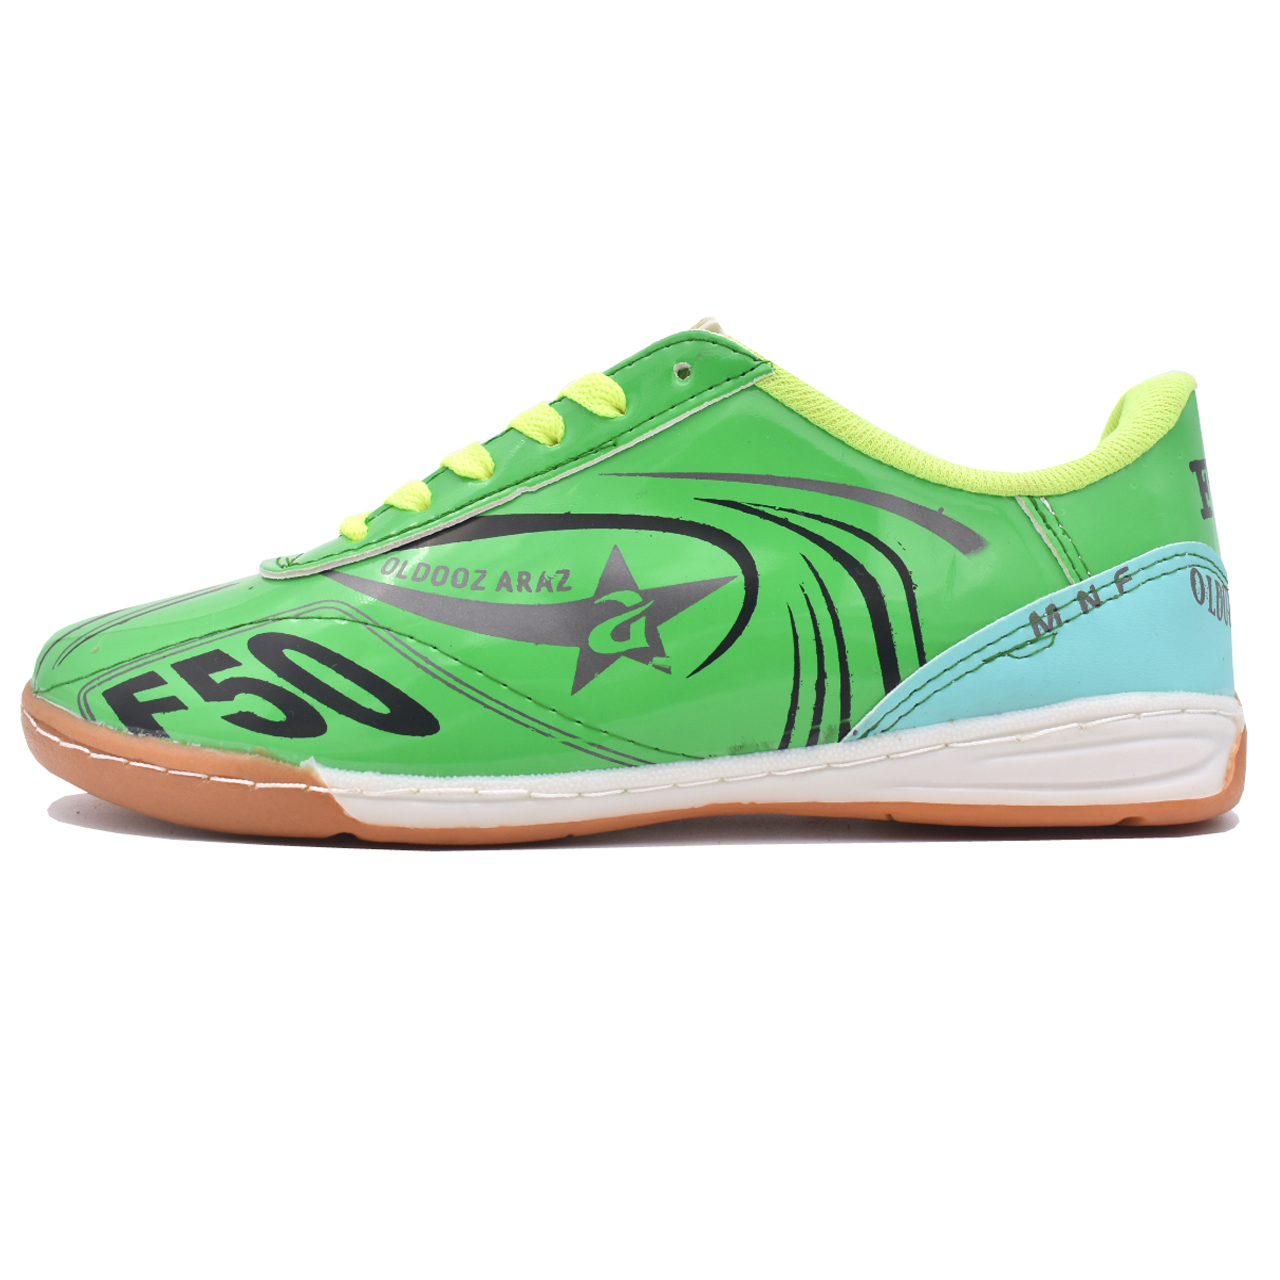 کفش فوتسال مردانه کد C-3769